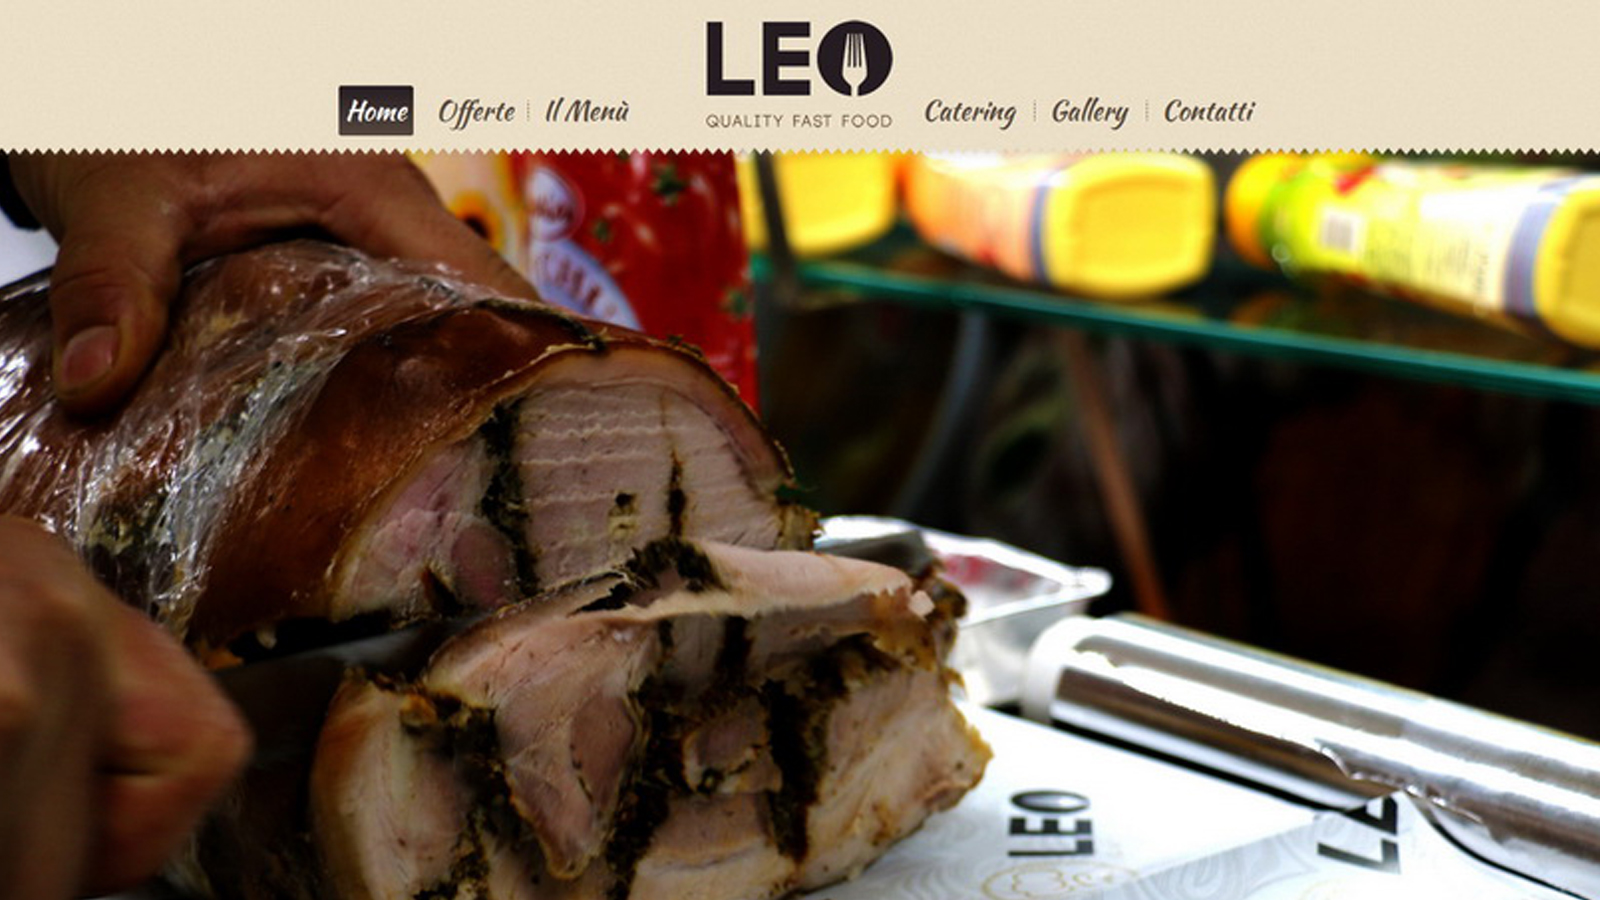 leo fast food picsel design web graphic. Black Bedroom Furniture Sets. Home Design Ideas